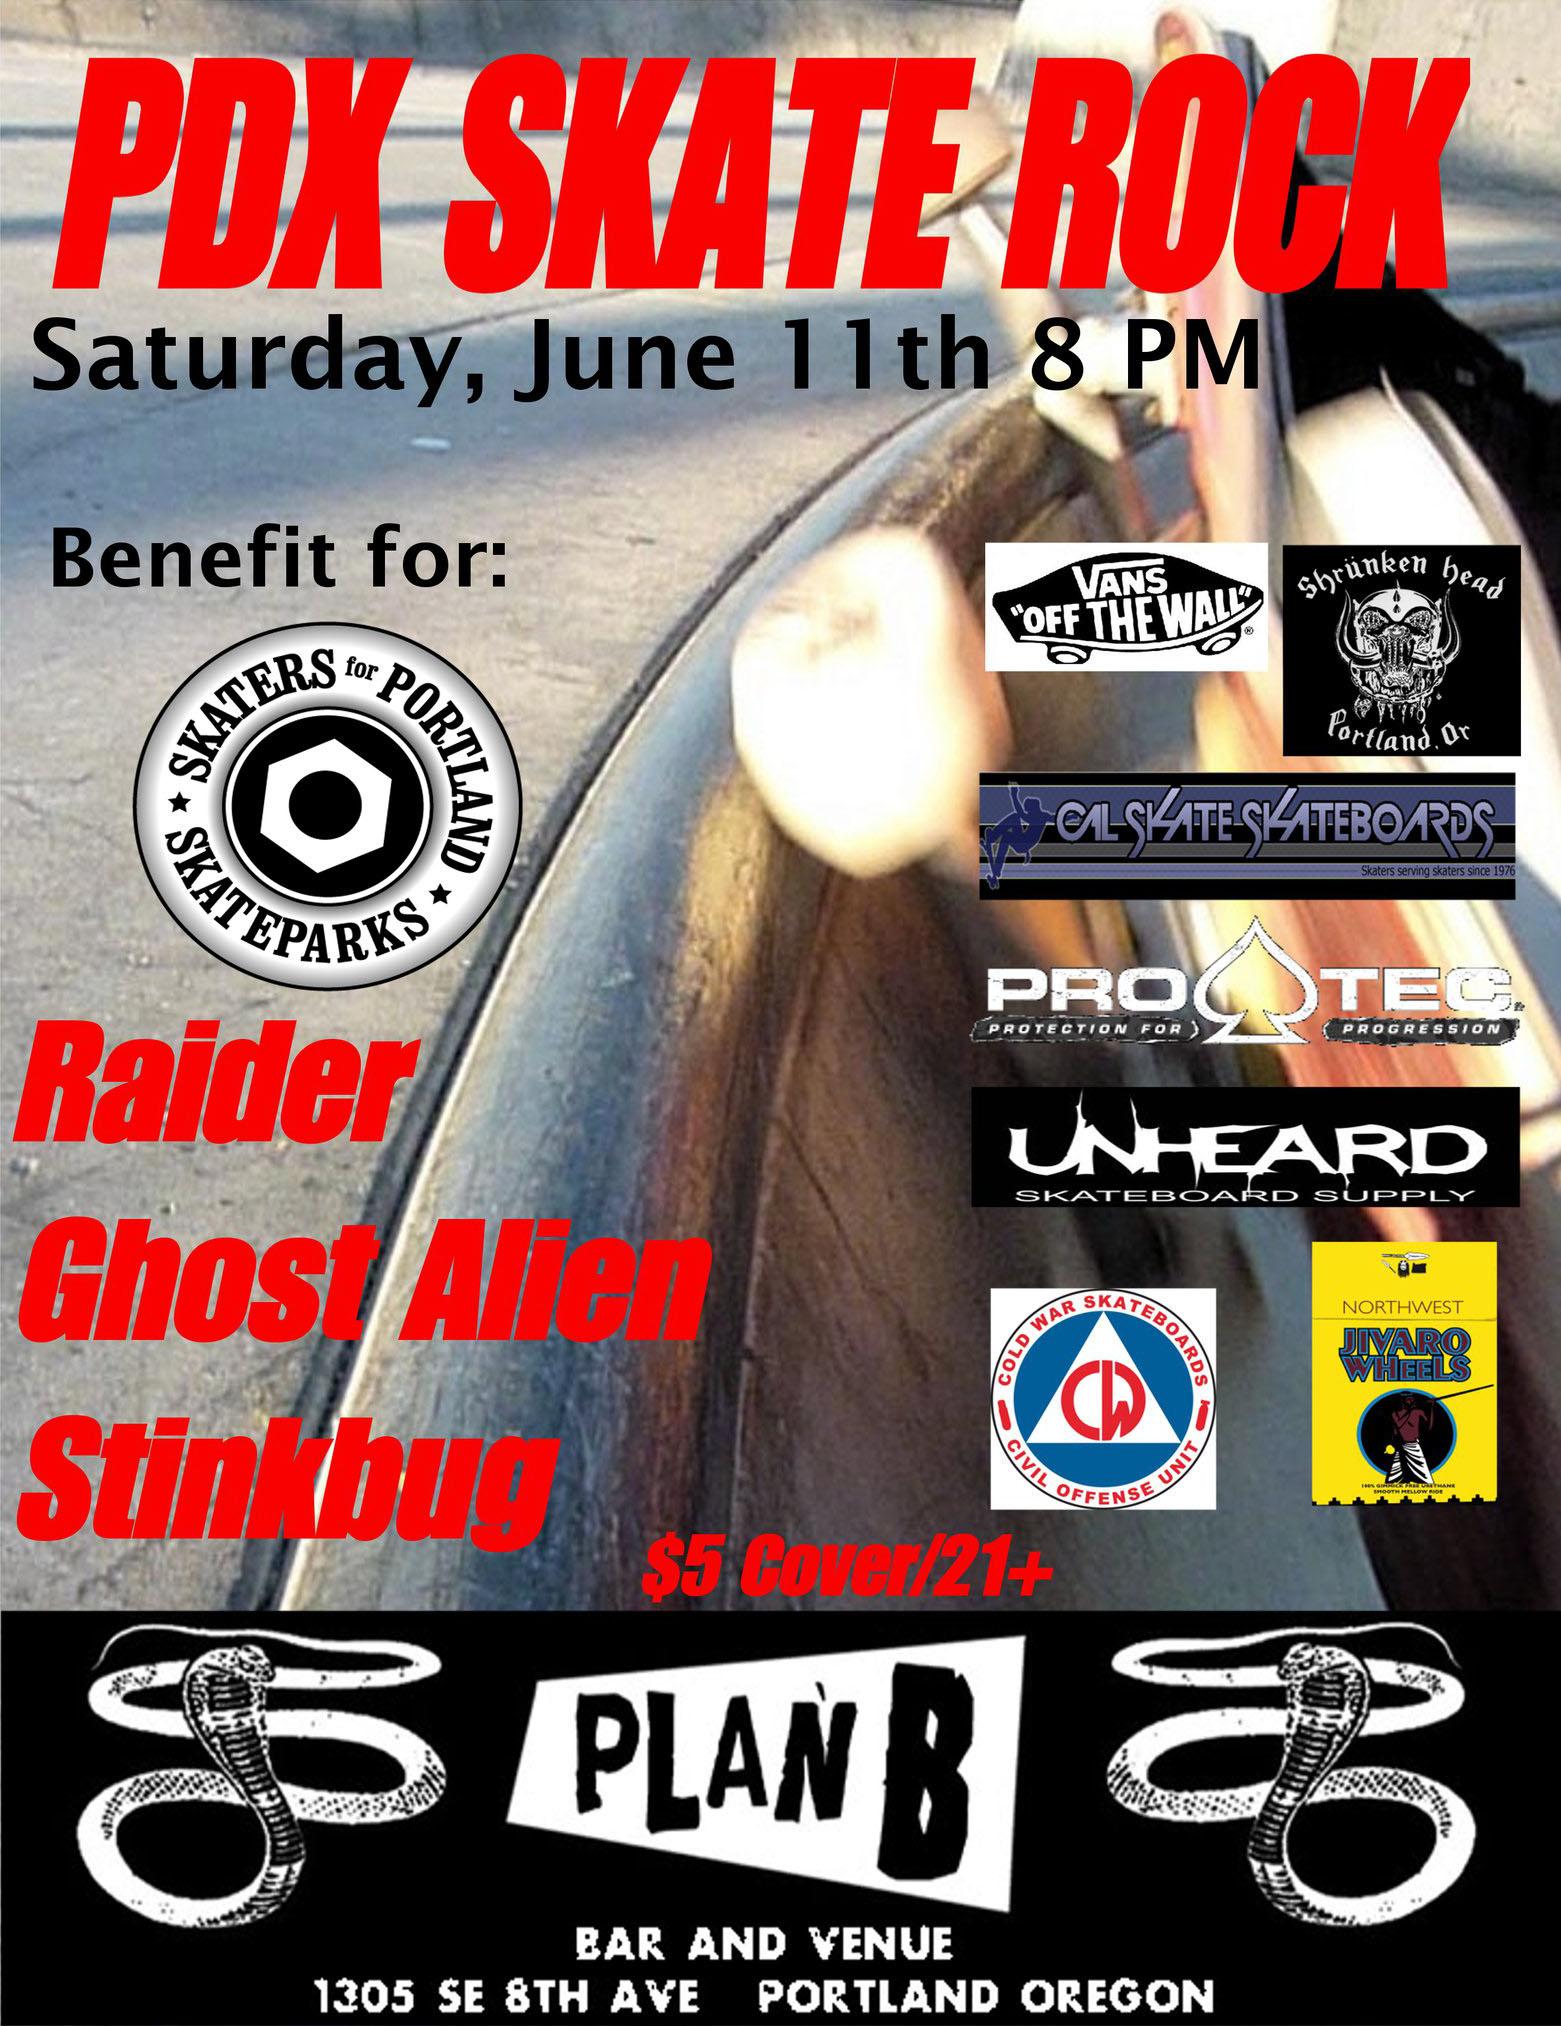 Benefit for Skaters for Portland Skateparks @ Plan B, Saturday June 11, 2011